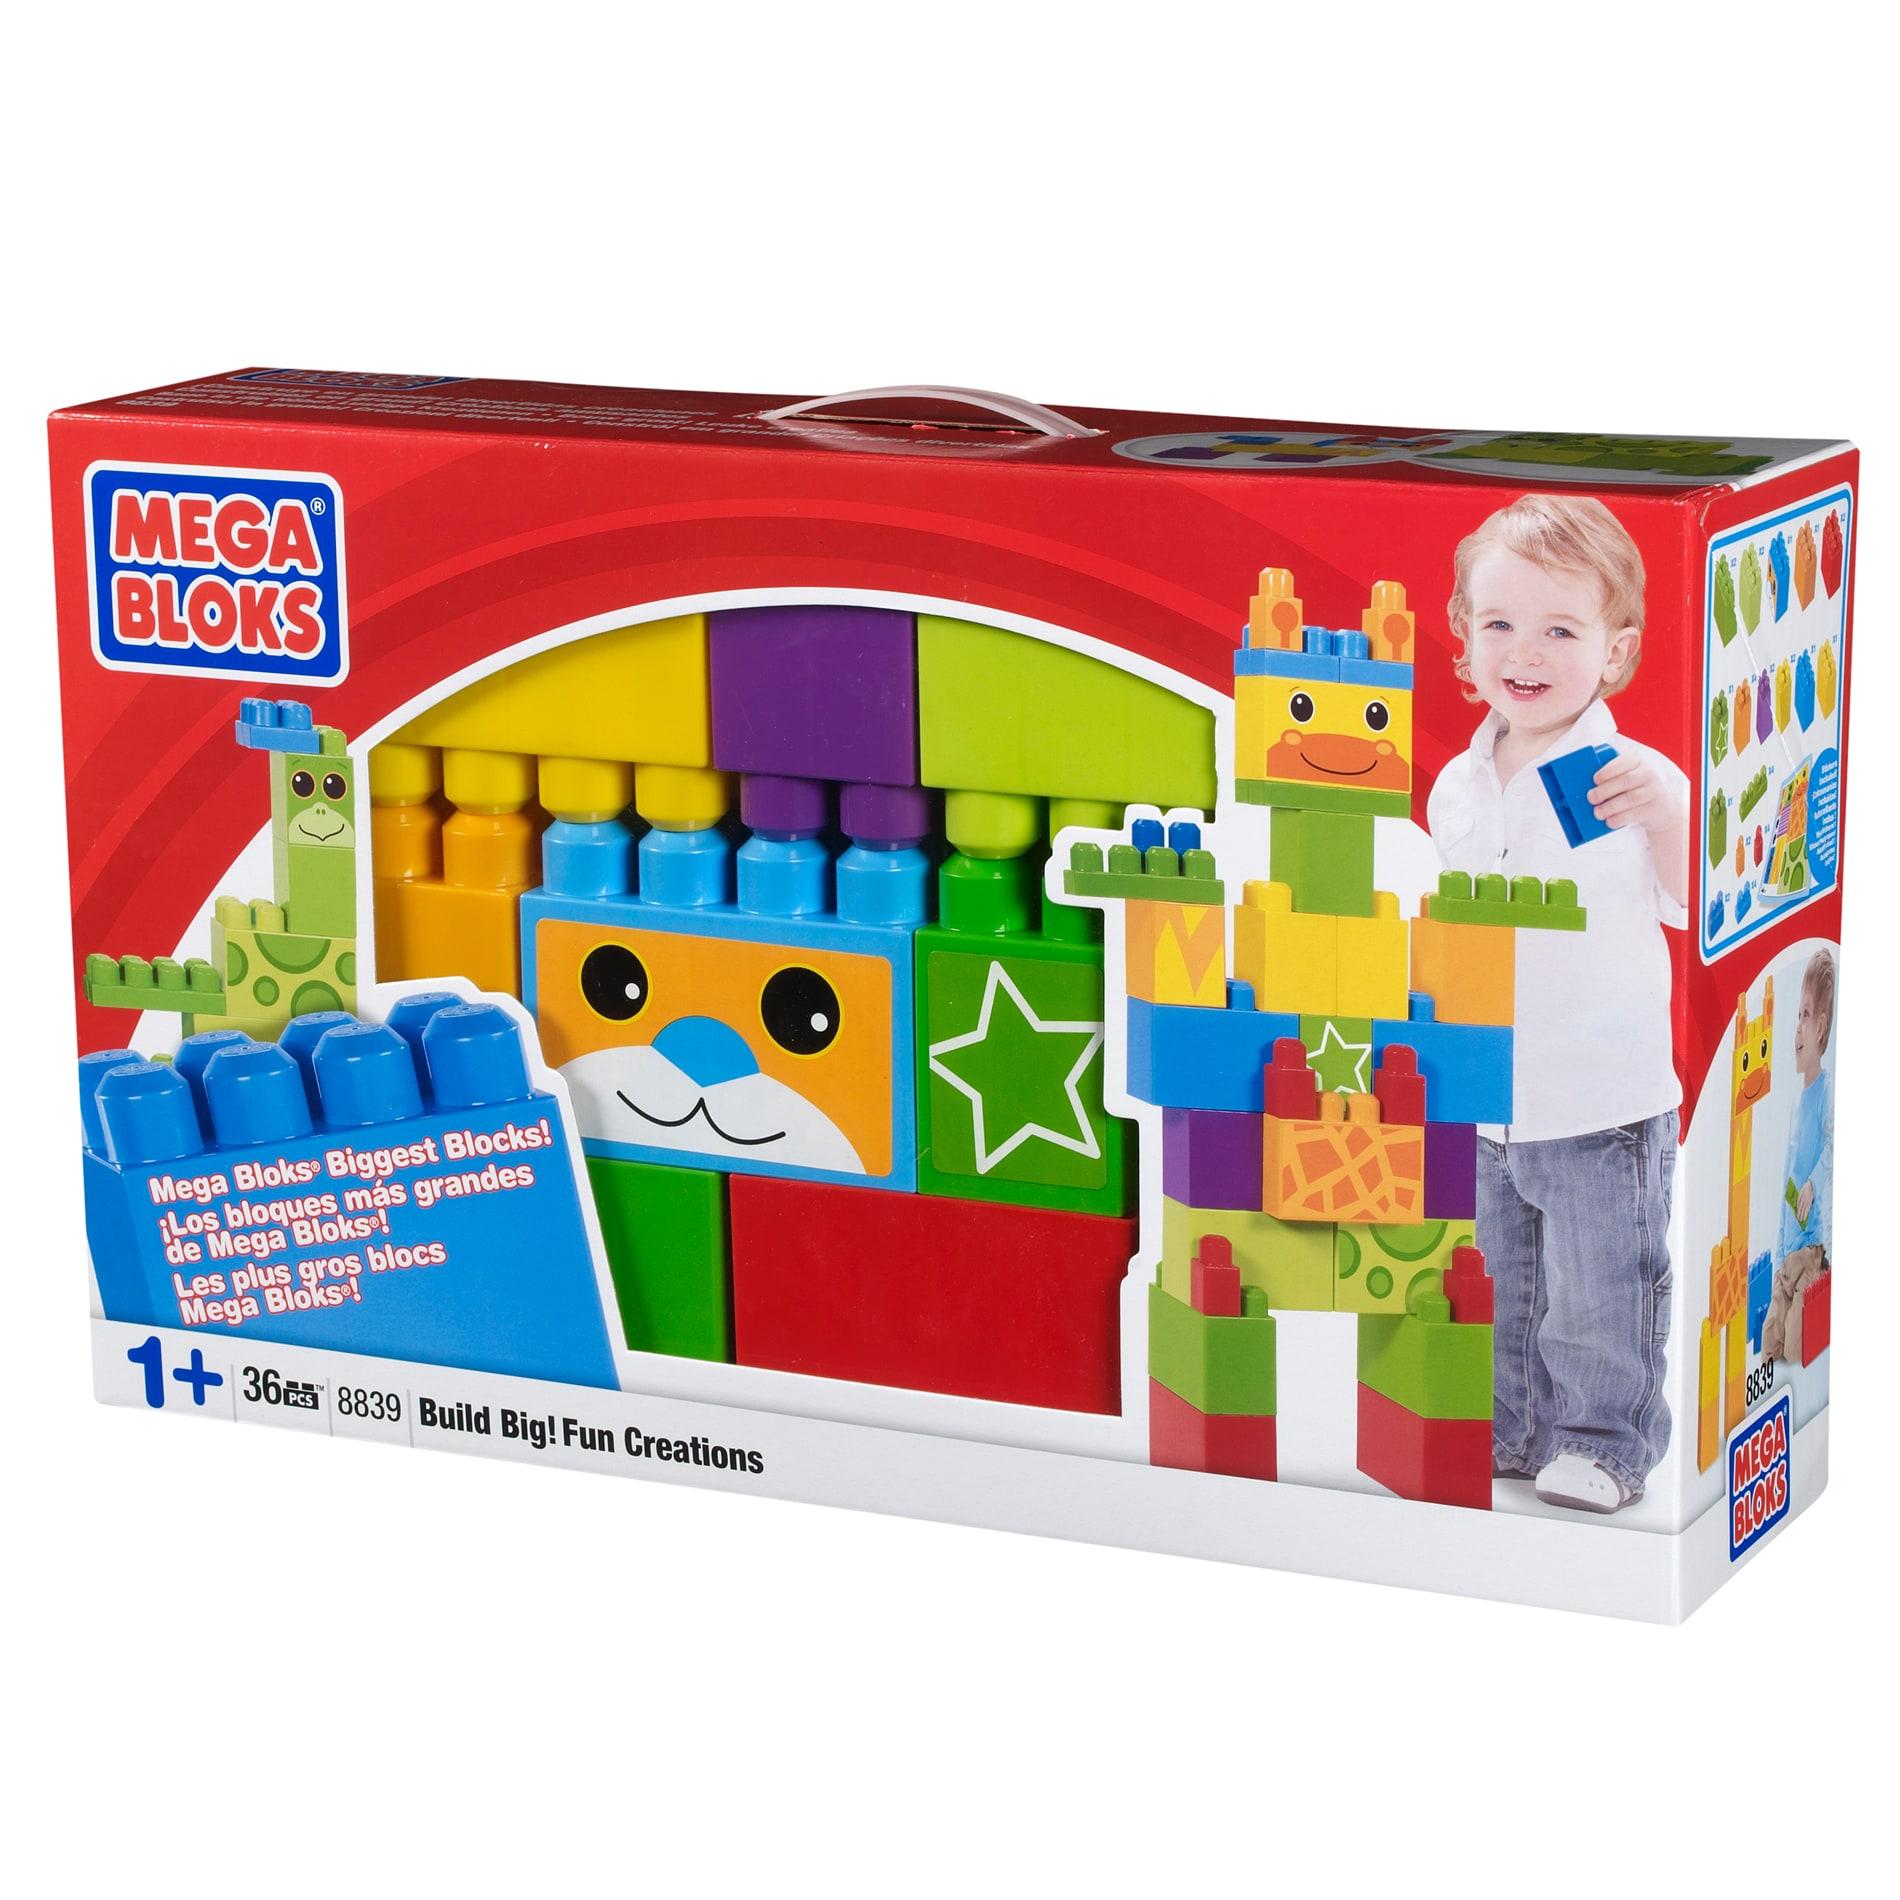 Mega Bloks Build Big Fun Creations Box